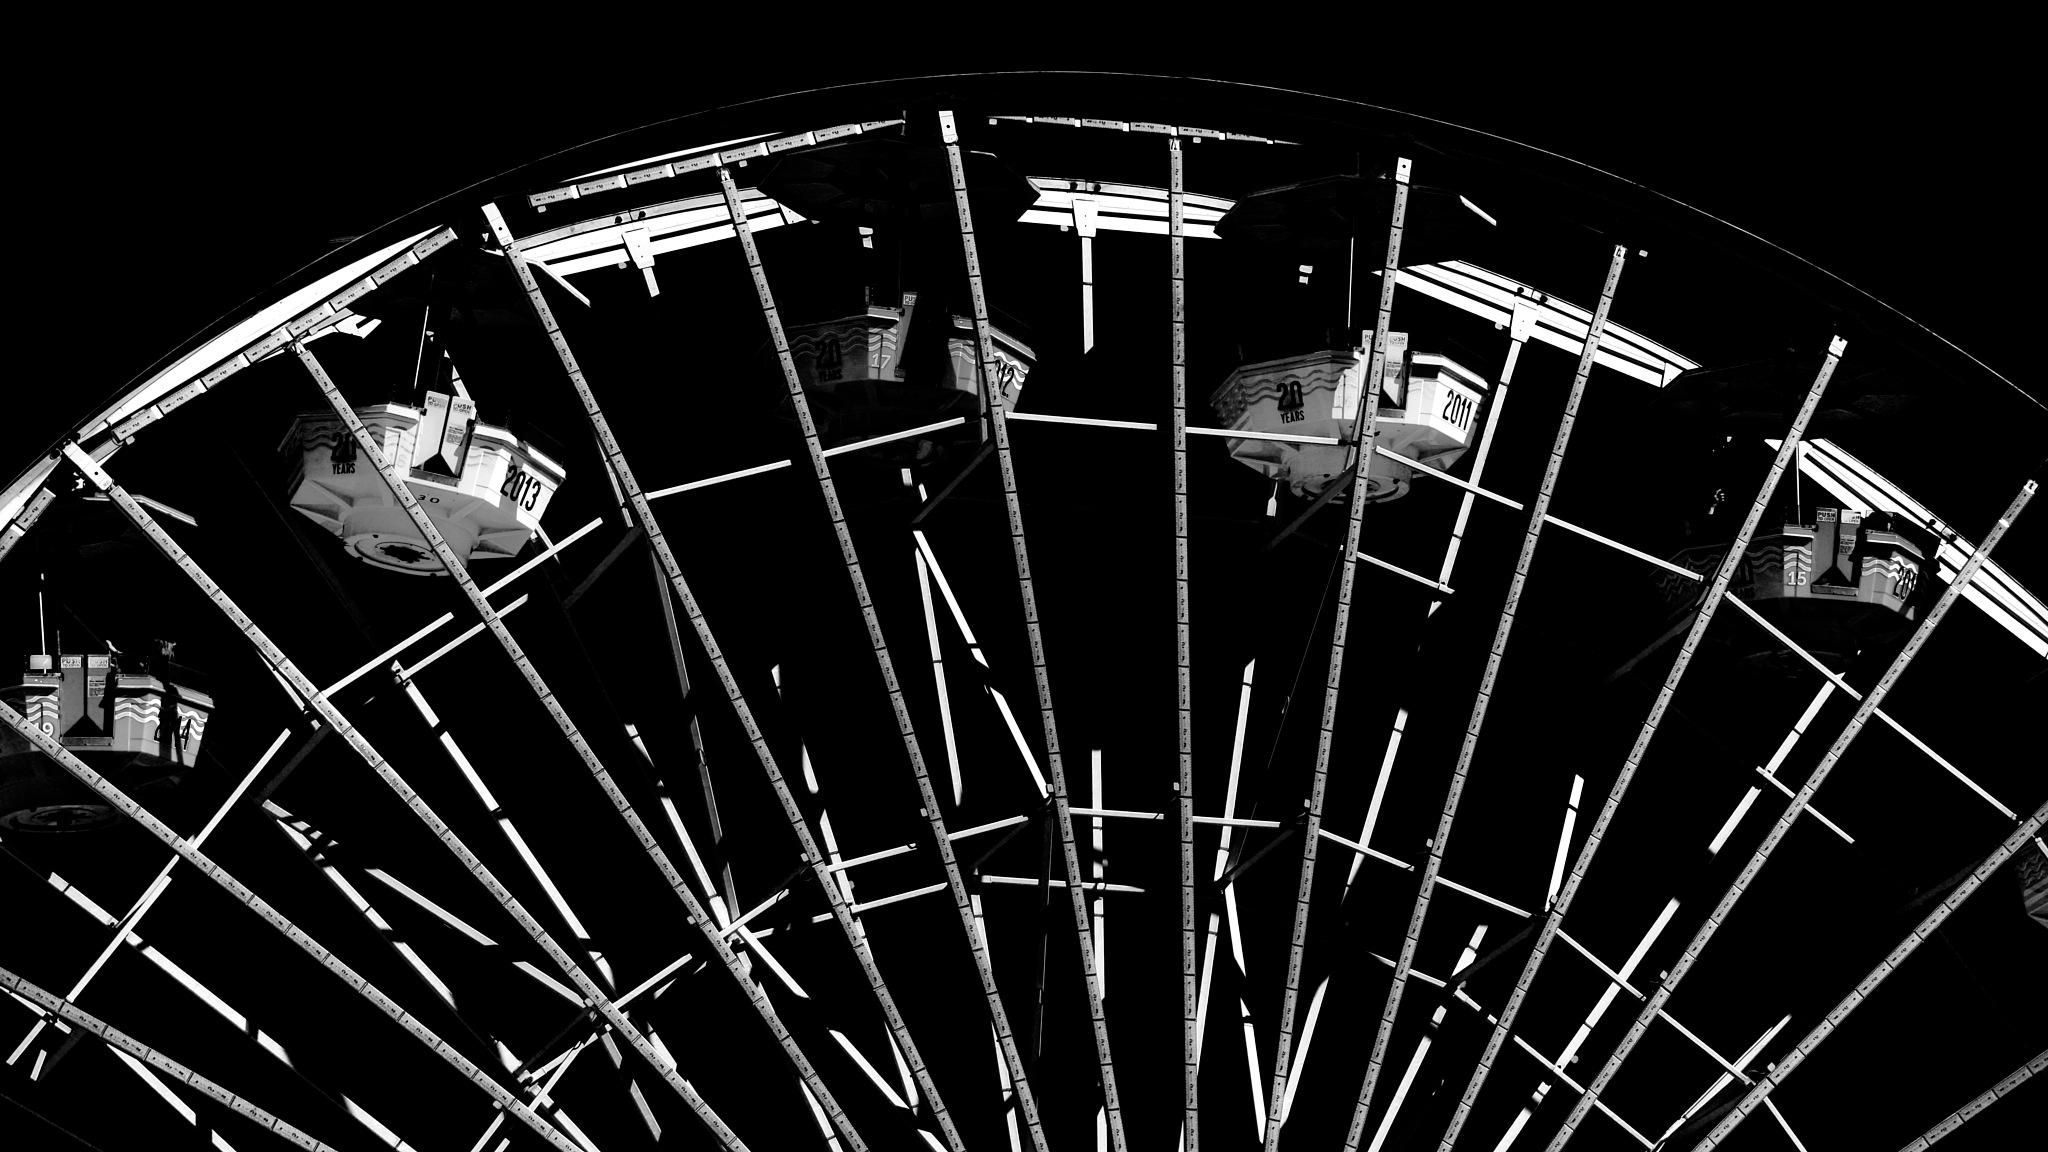 Roda gigante by WSimone